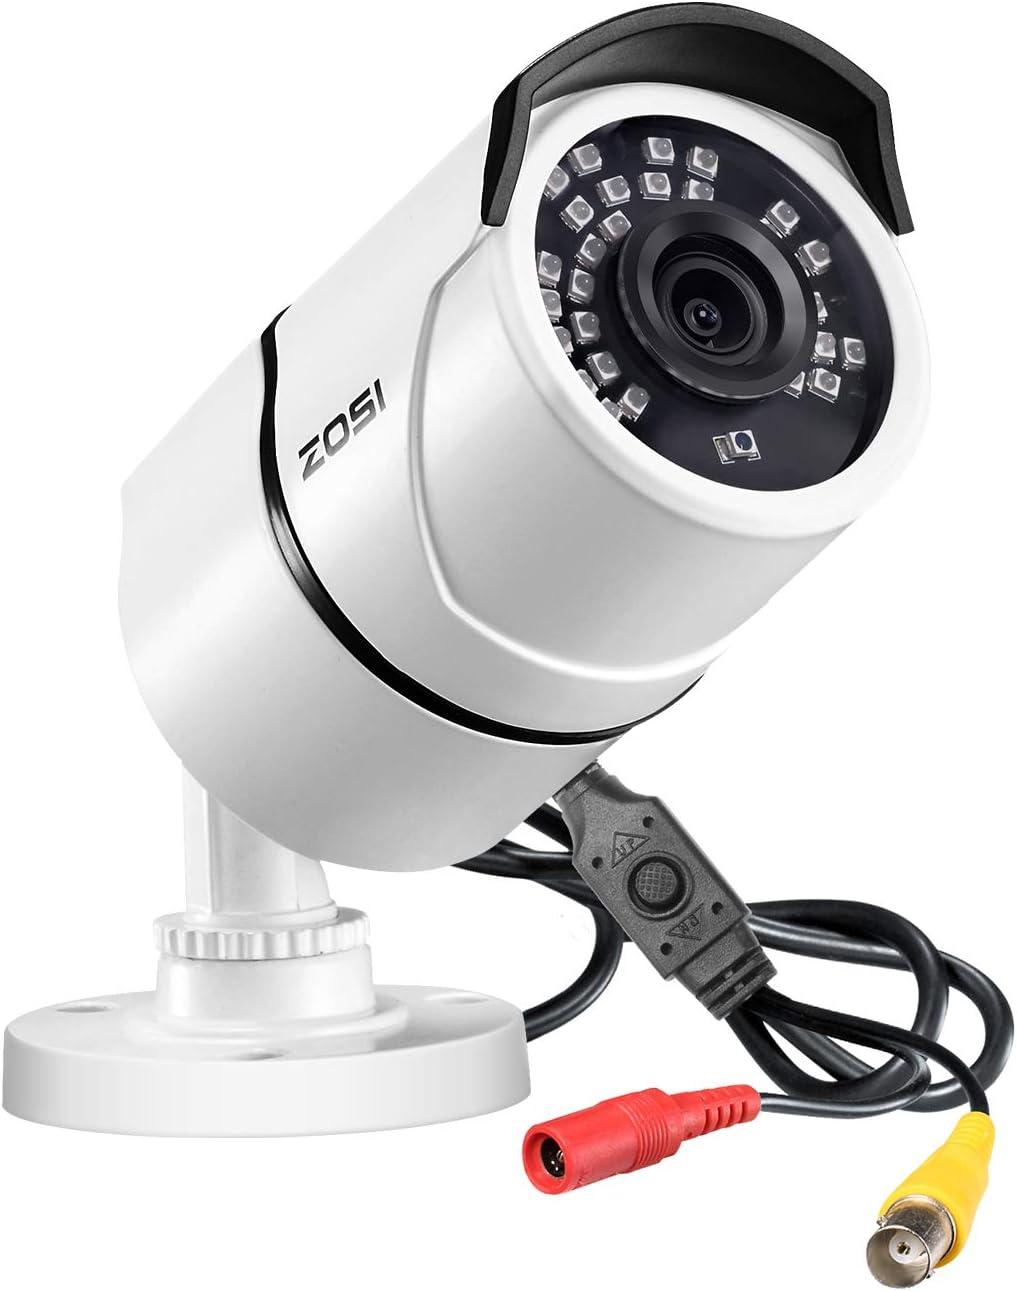 ZOSI 2.0MP FHD 1080p 1920TVL Security Camera Outdoor Indoor (Hybrid 4-in-1 HD-CVI/TVI/AHD/960H Analog CVBS),36PCS LEDs,100ft IR Night Vision,Weatherproof Surveillance CCTV Bullet Camera Housing